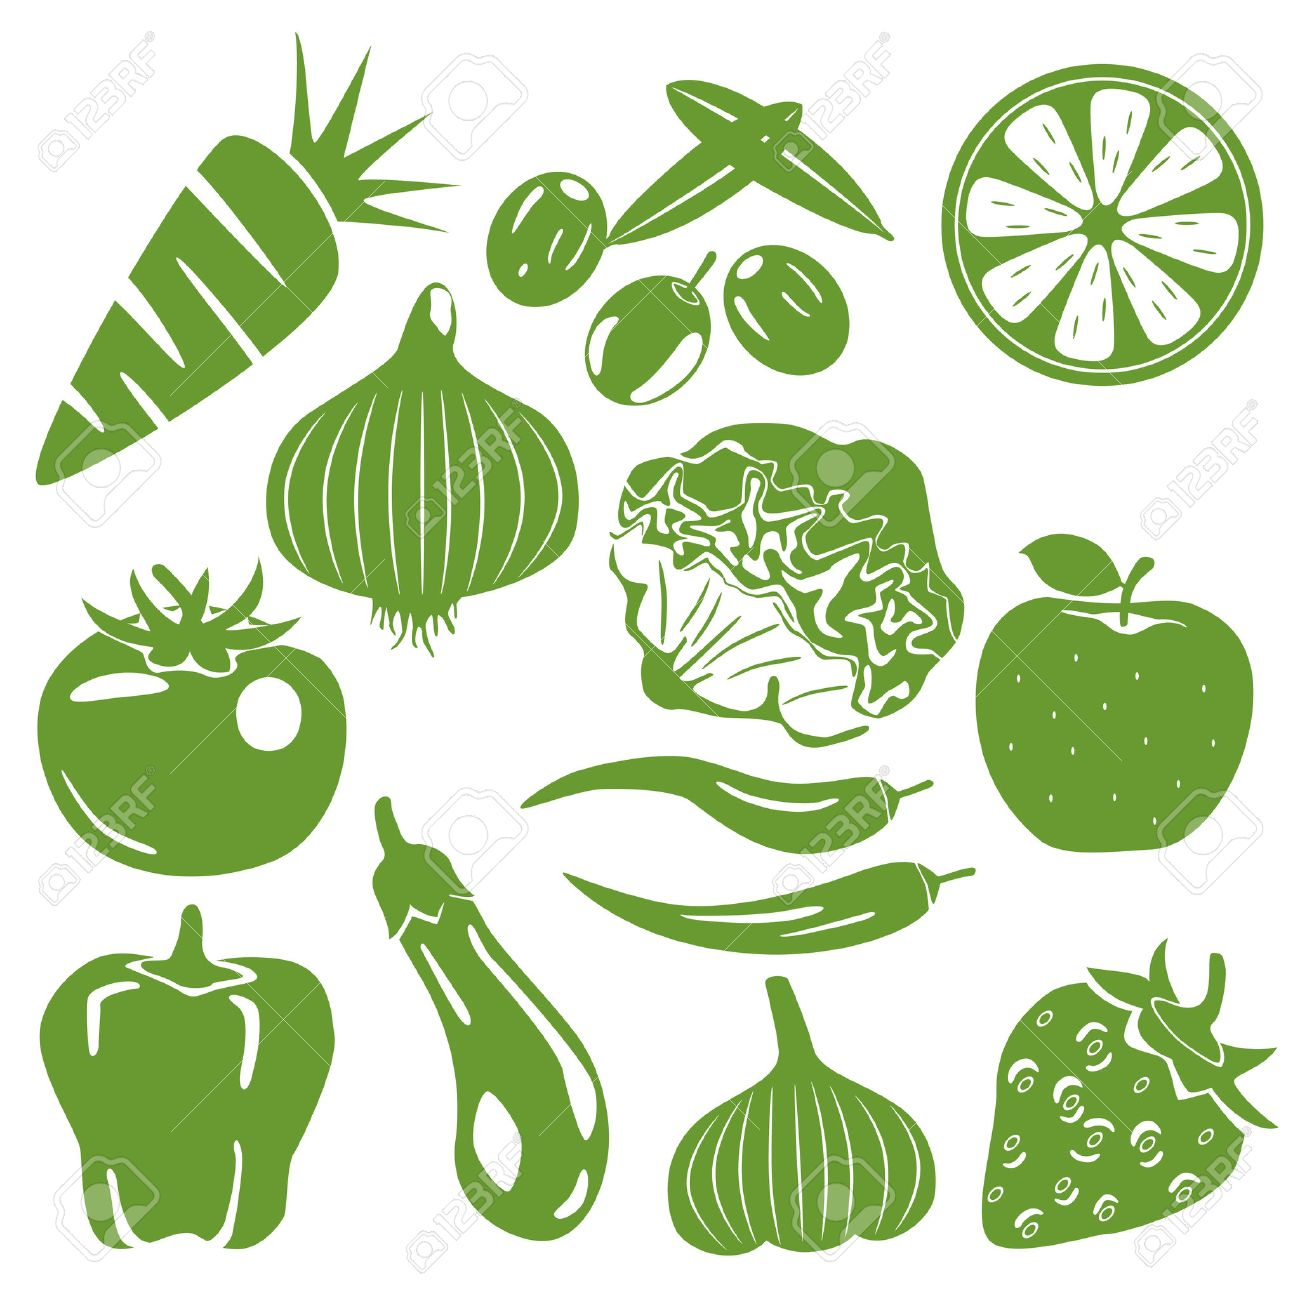 Foodstuff green icons set. Illustration vector. - 8913097